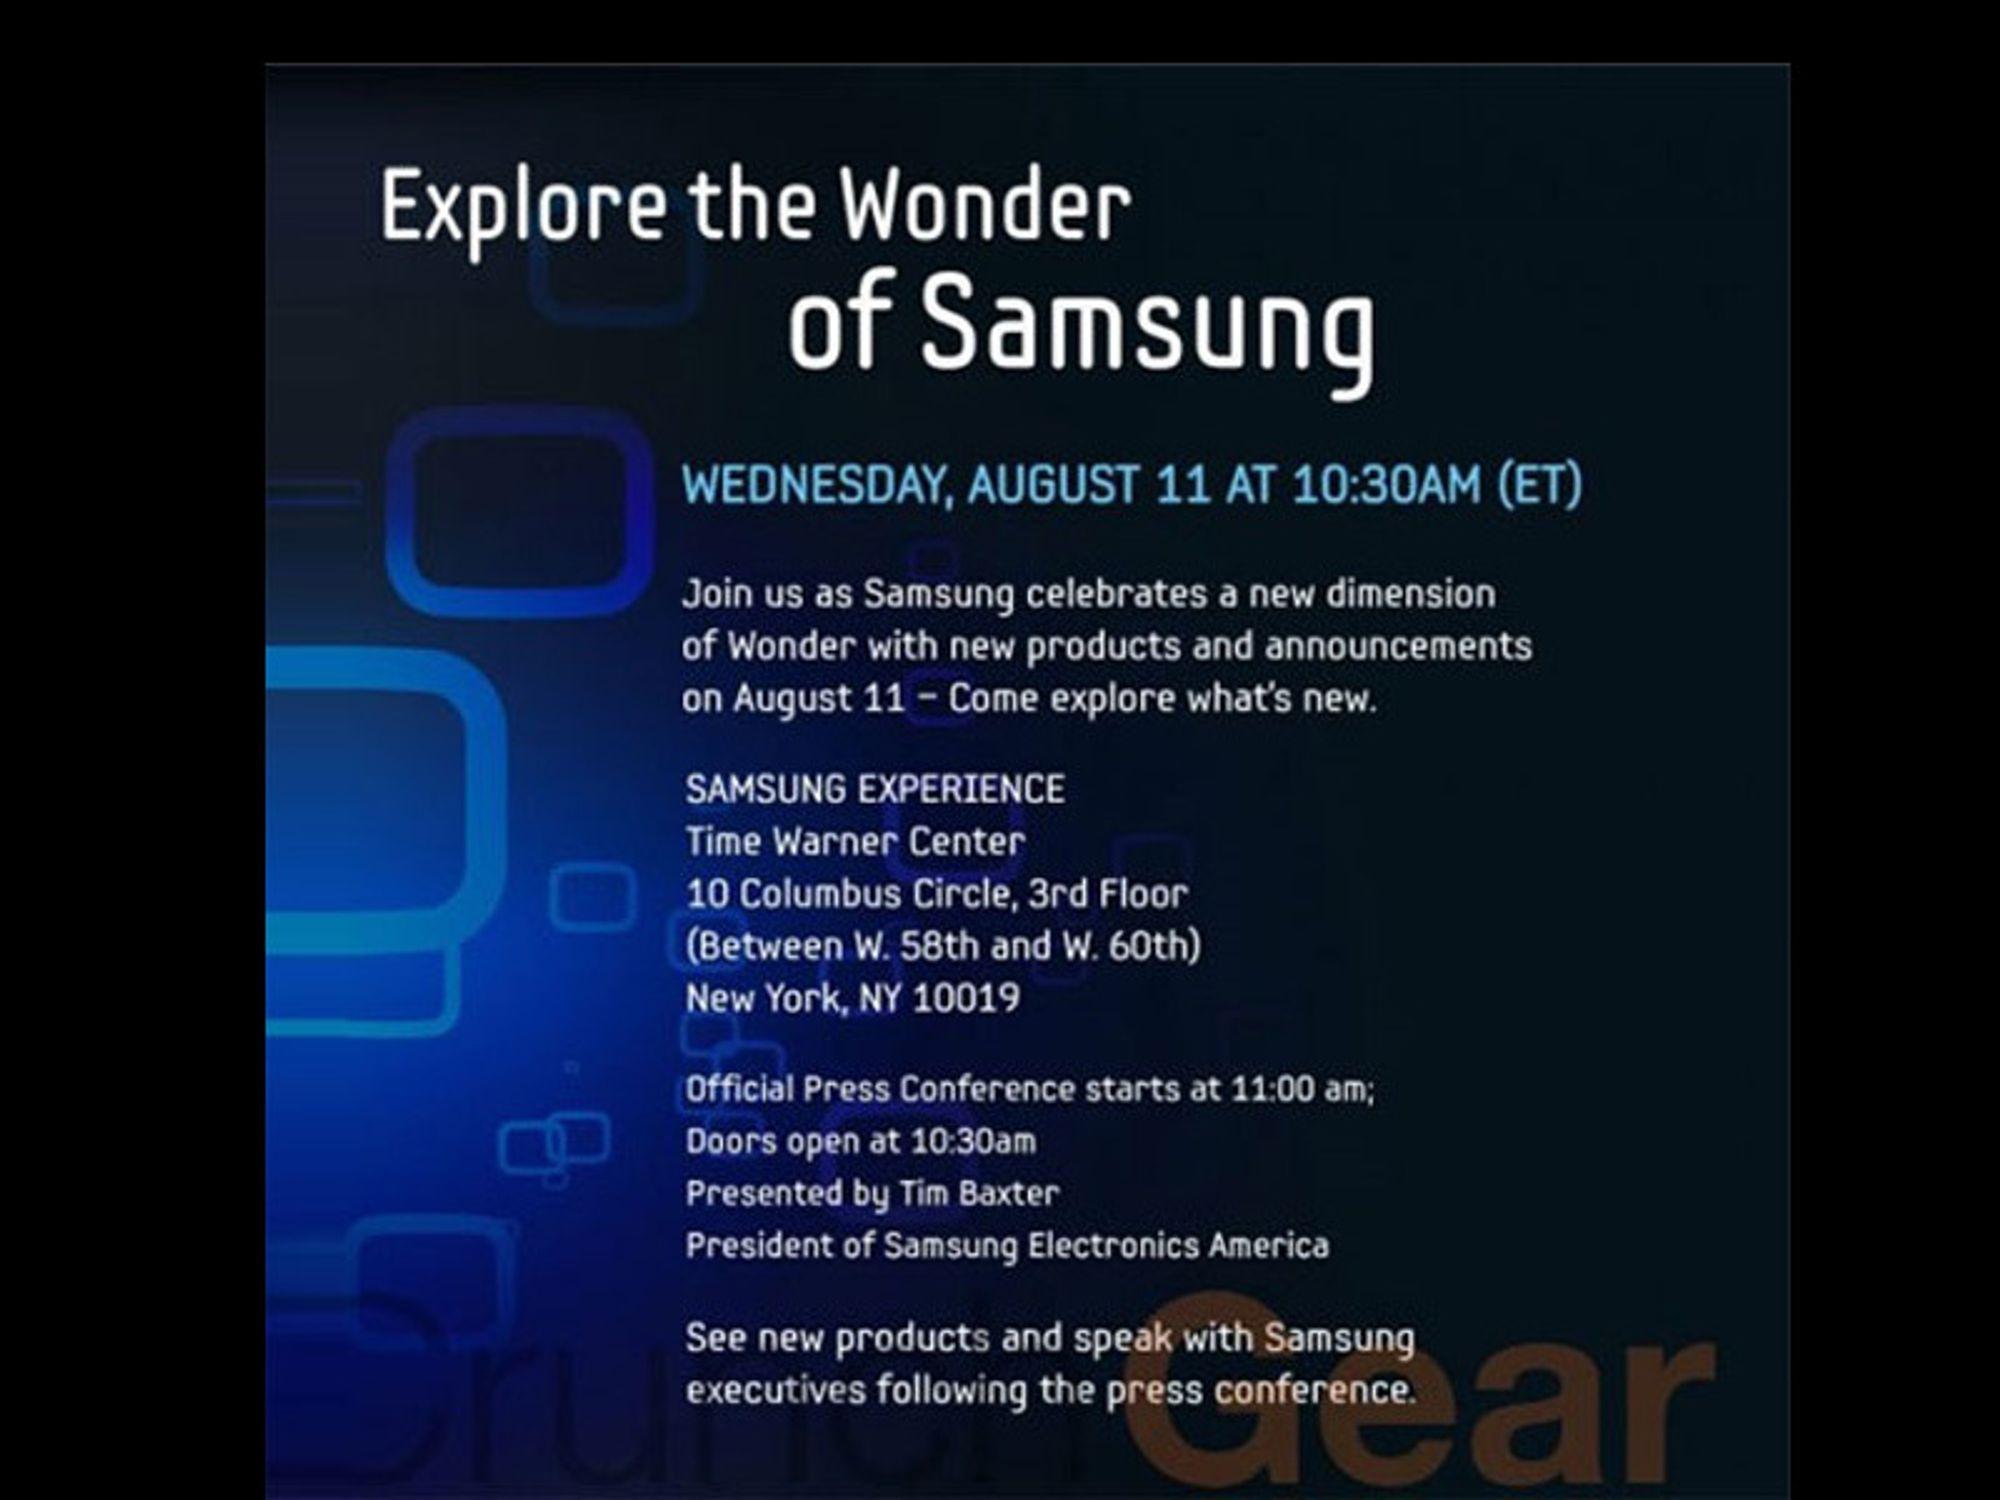 Hva skal Samsung vise frem i morgen?